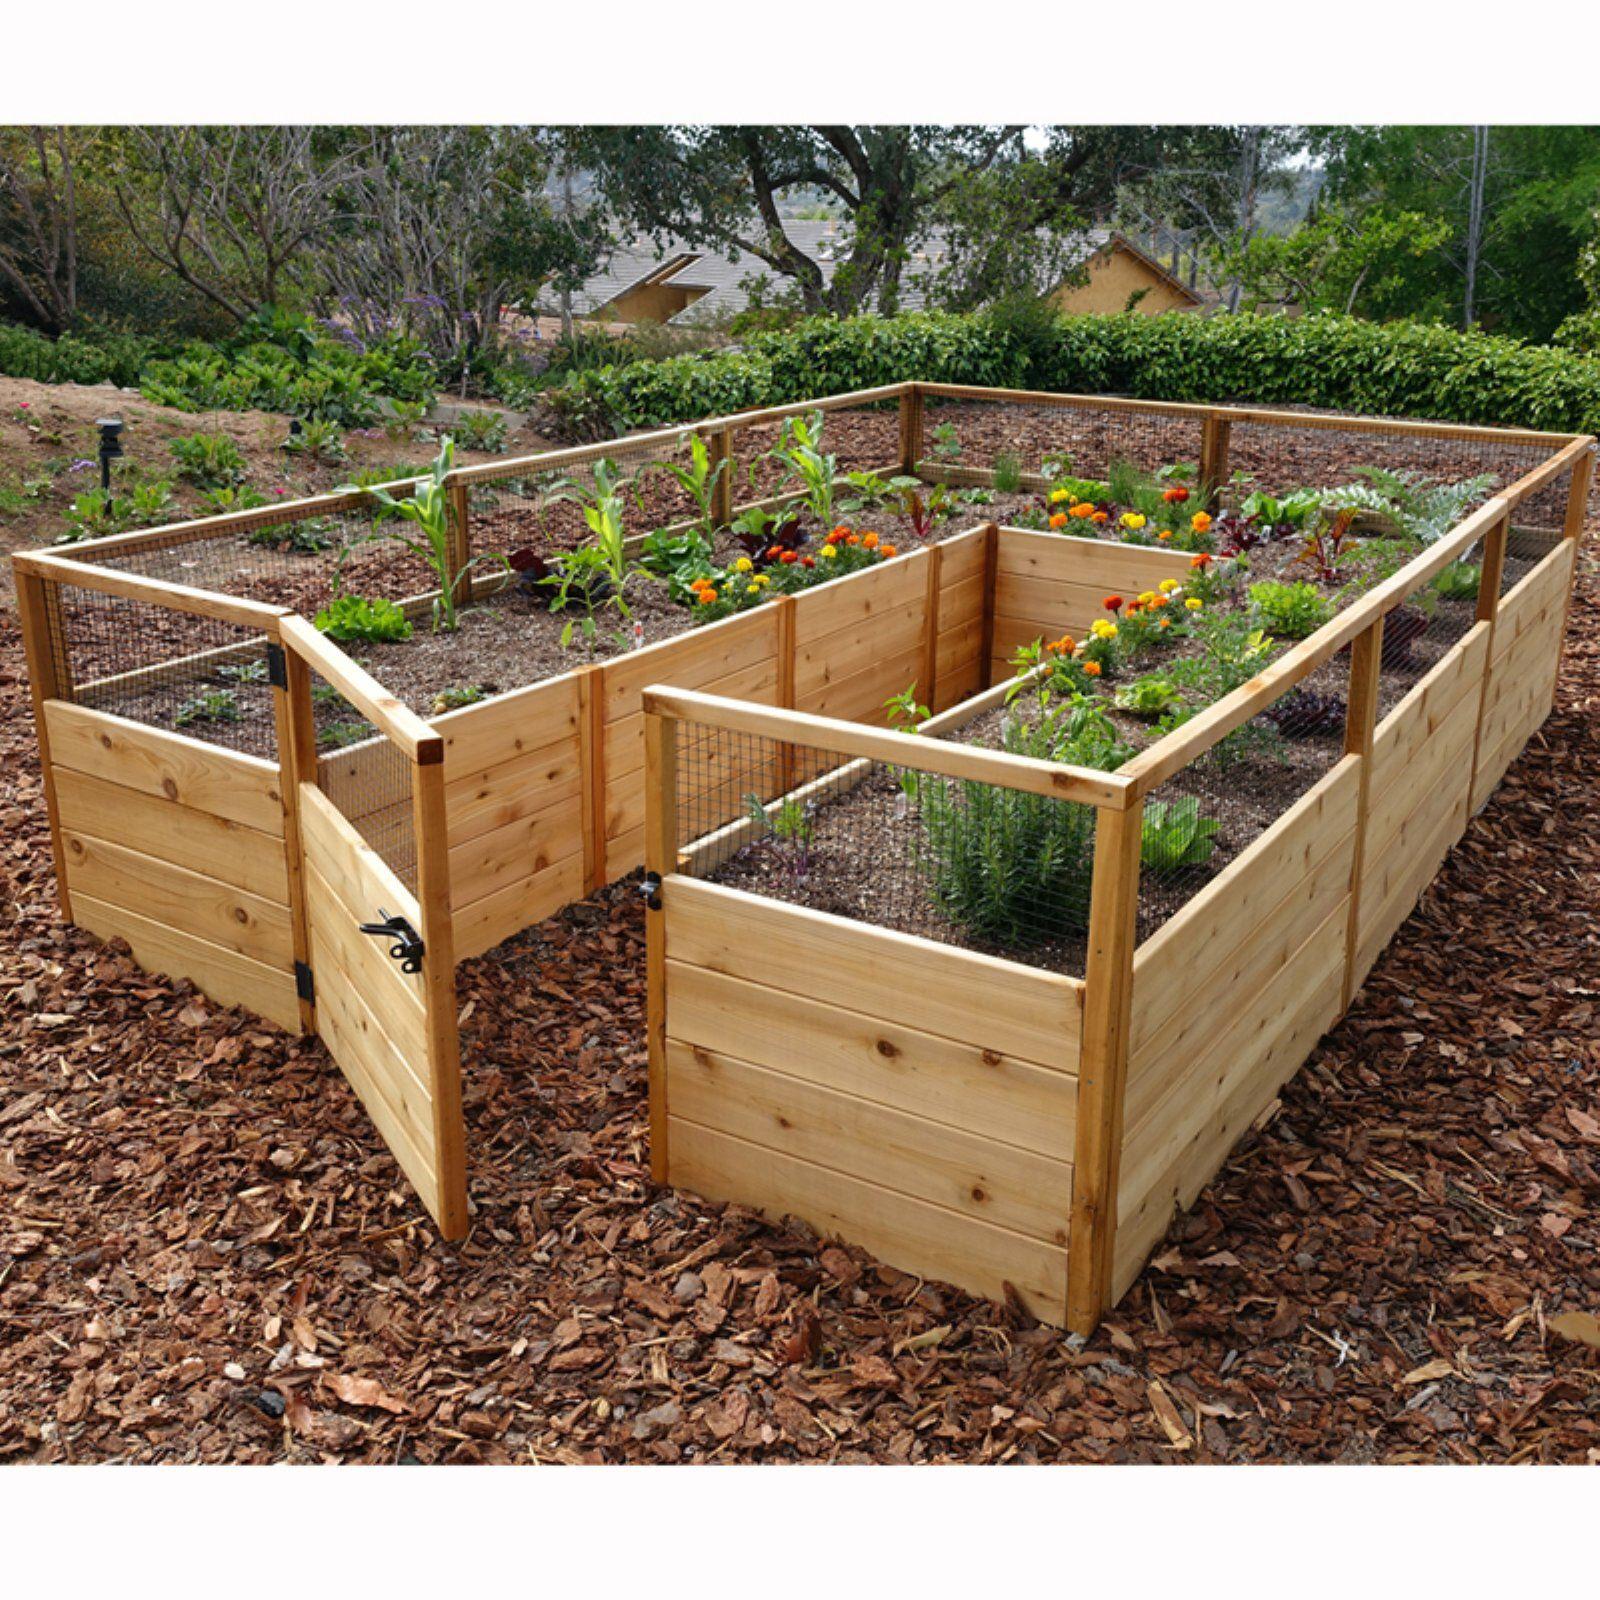 12 X 8 Cedar Raised Garden Bed Walmart 1600 00 Cedar Garden